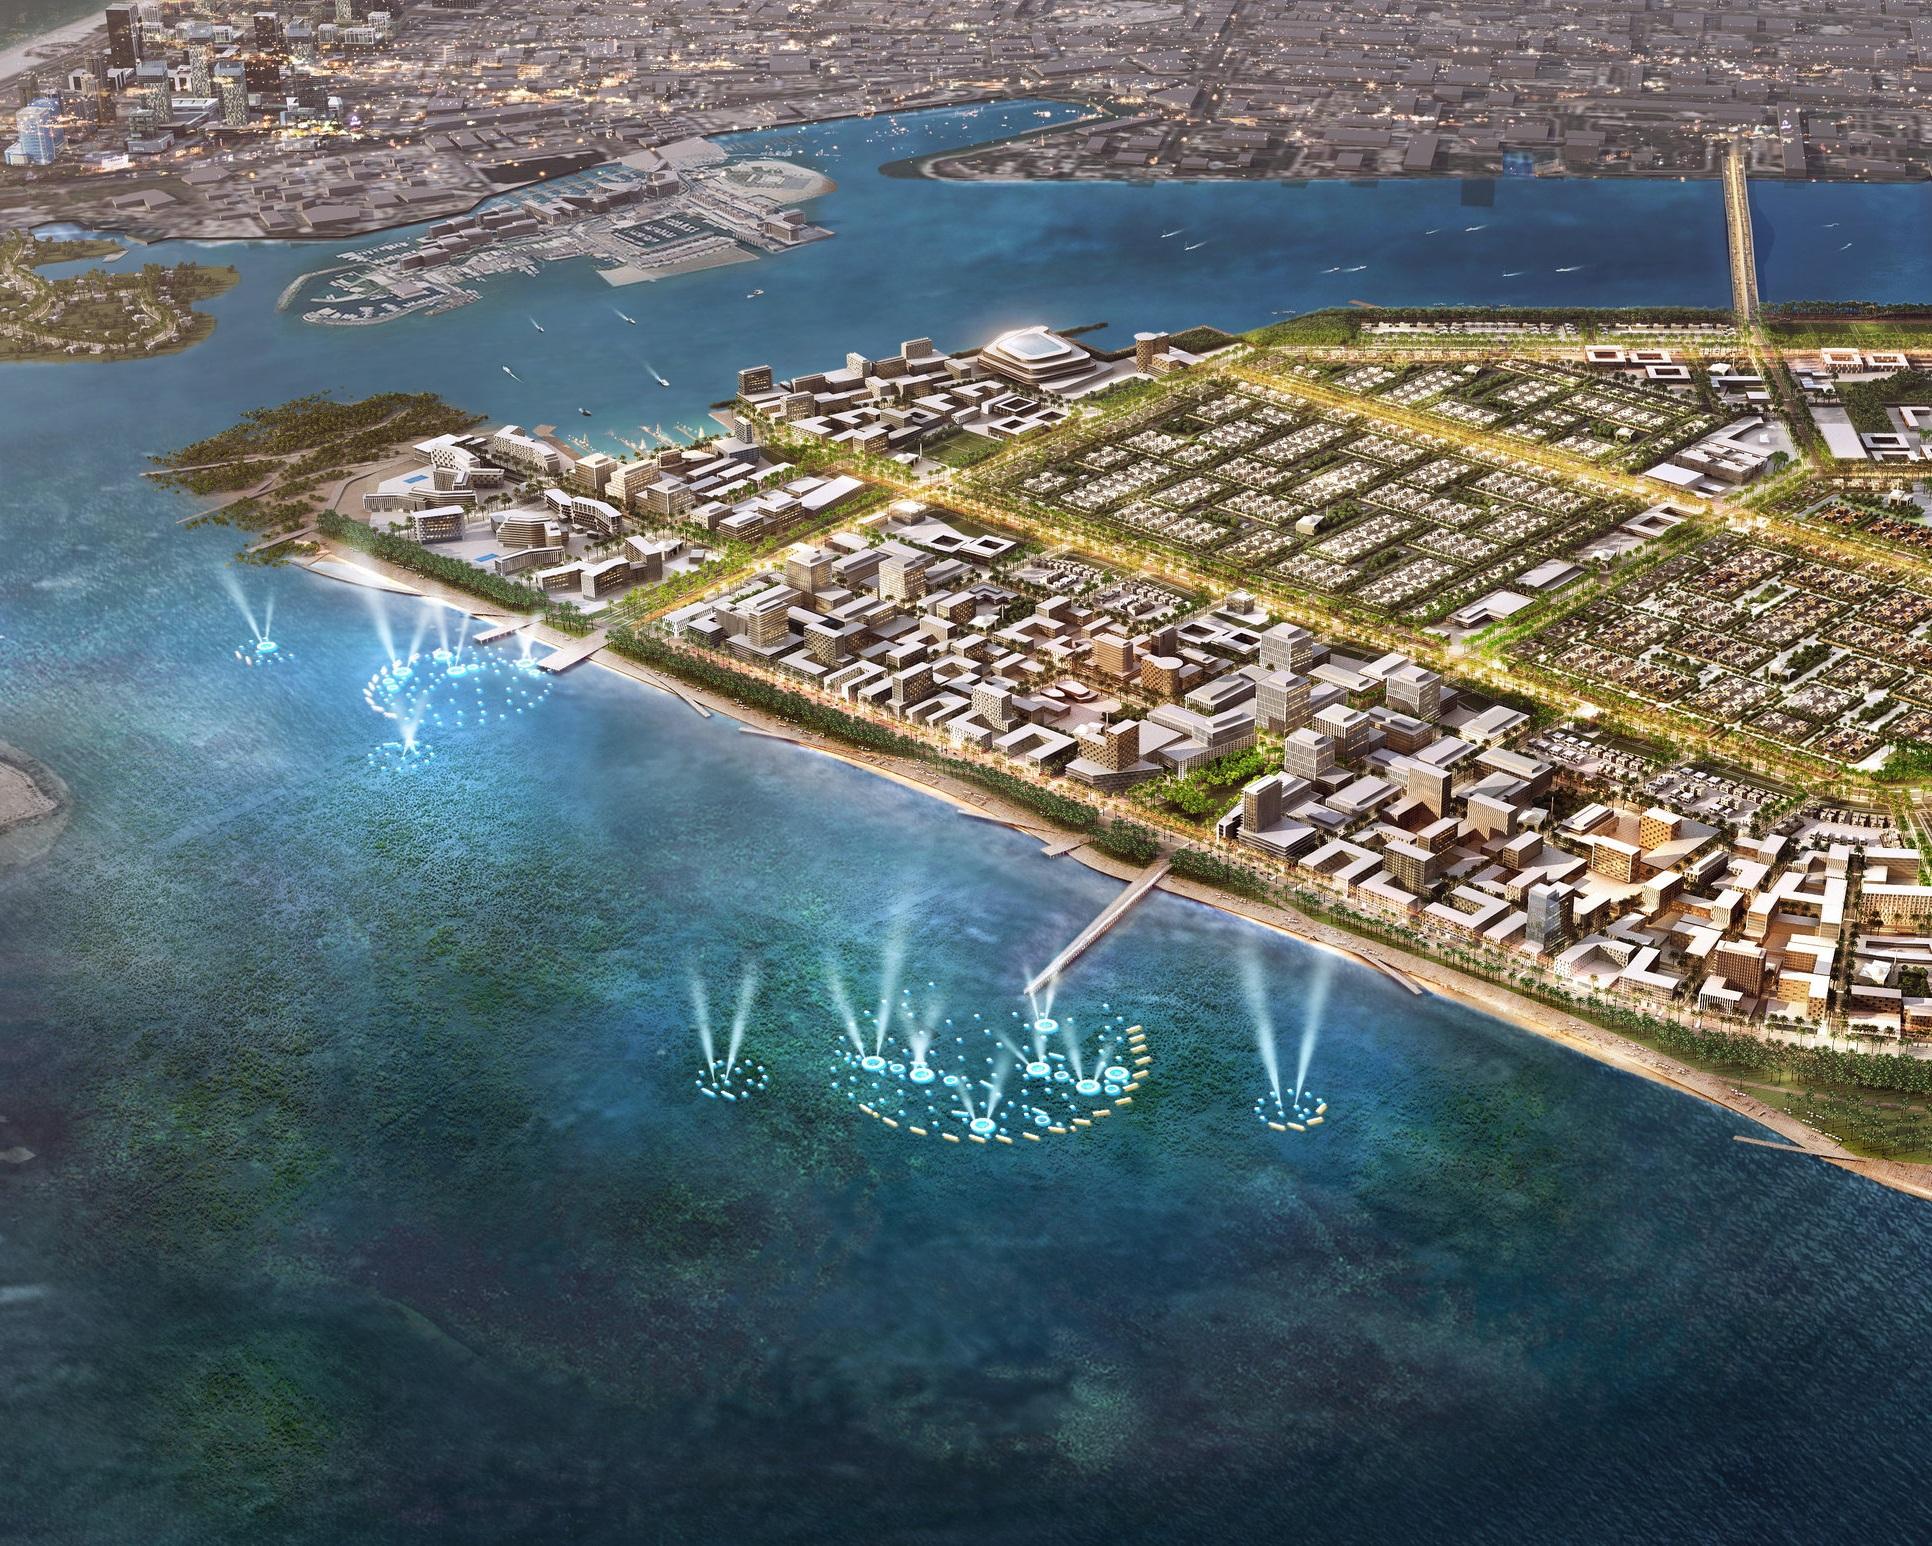 Hudayriat+Island+sea+grass+piers+render.jpg